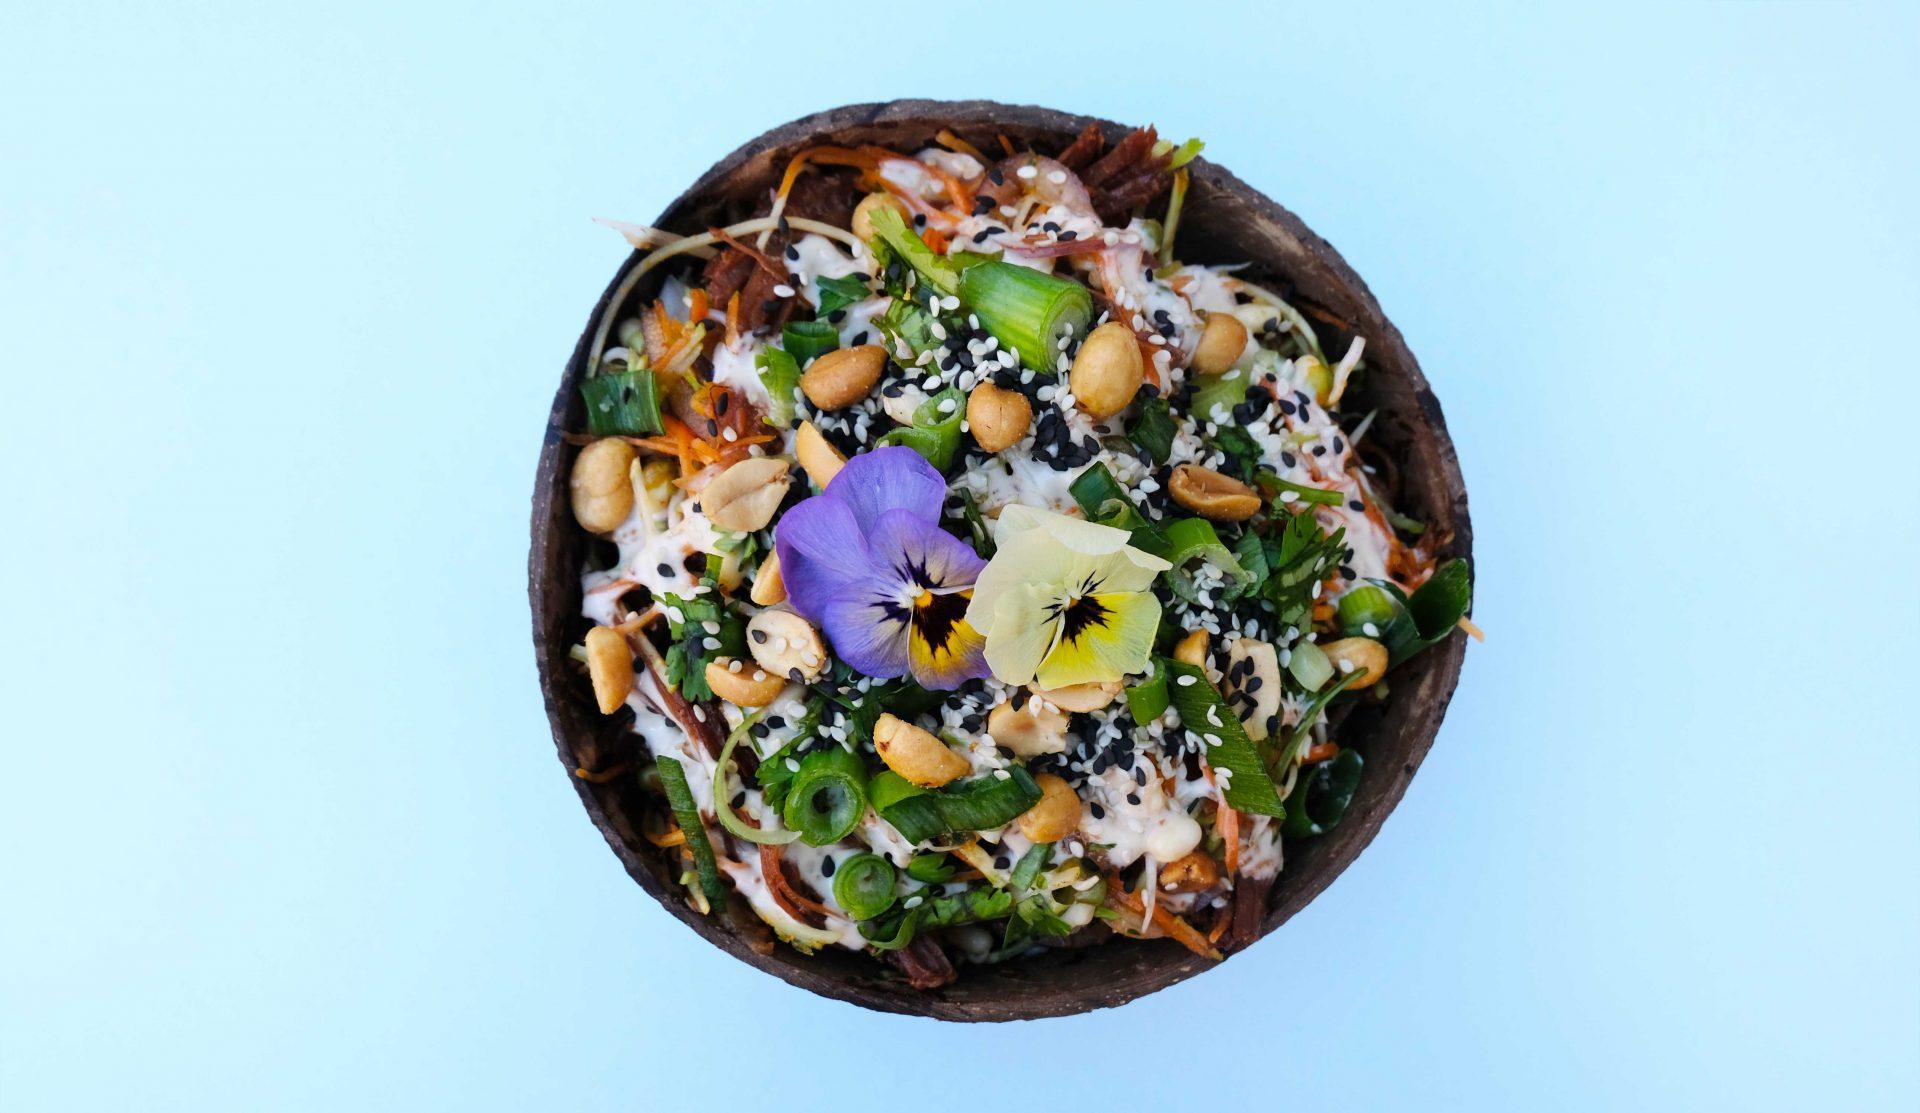 Mahalo Poke: Laver ny Waikiki-bowl med oksekød